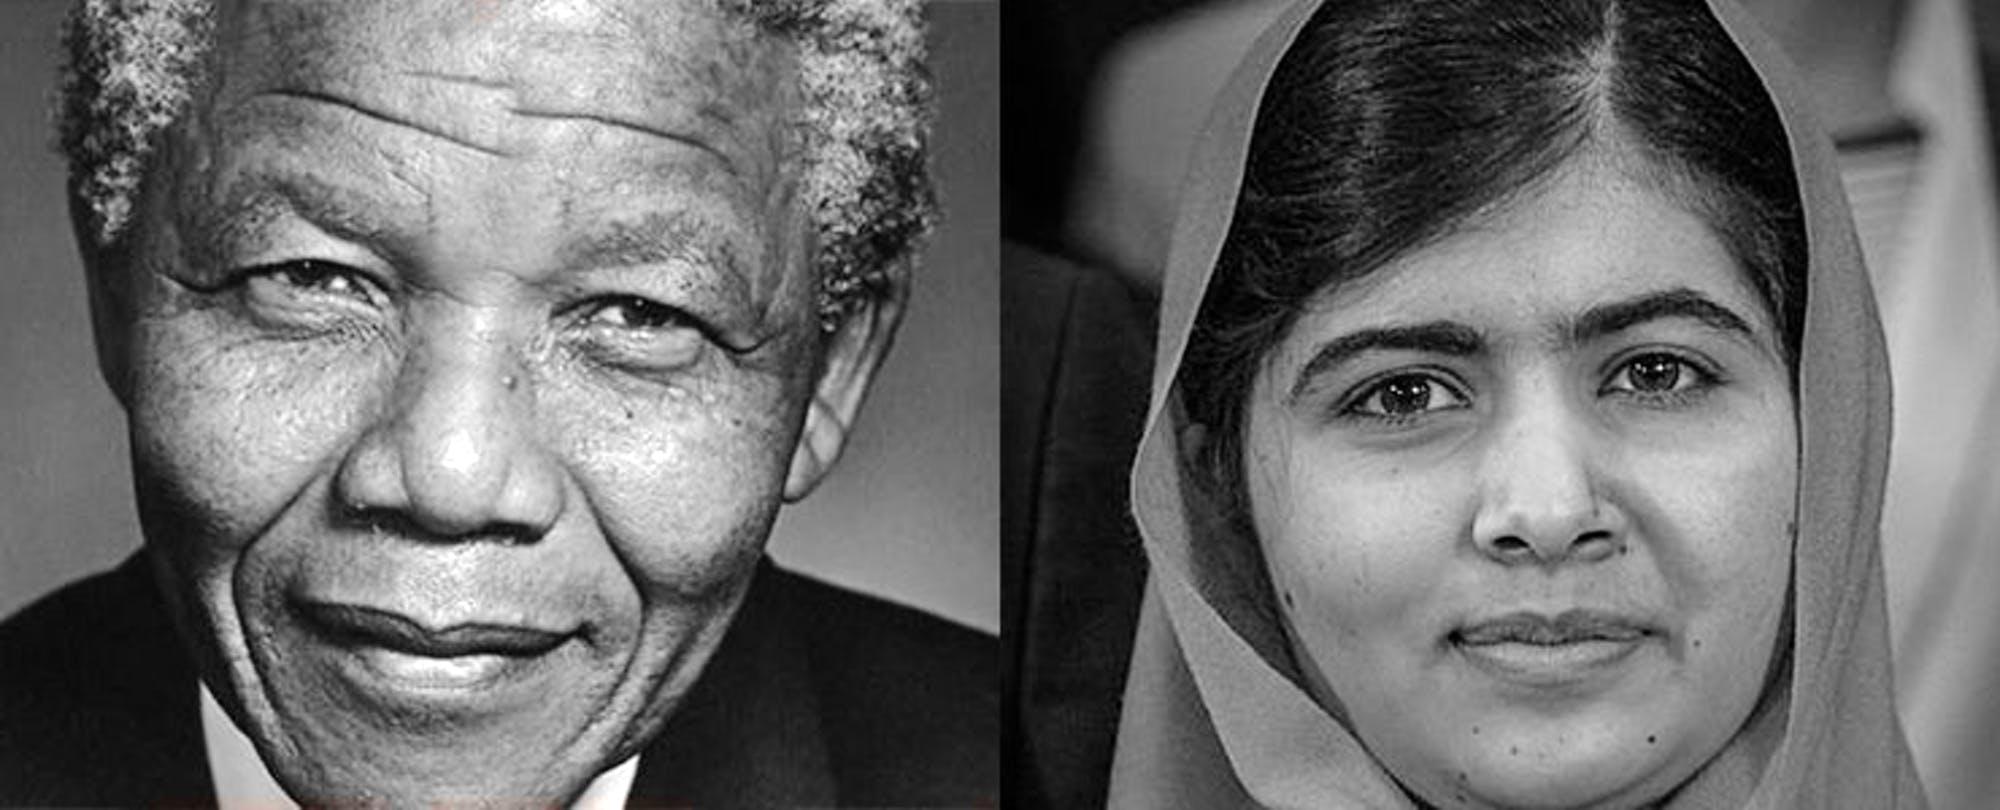 Seeking: Brilliantly Diverse Role Models